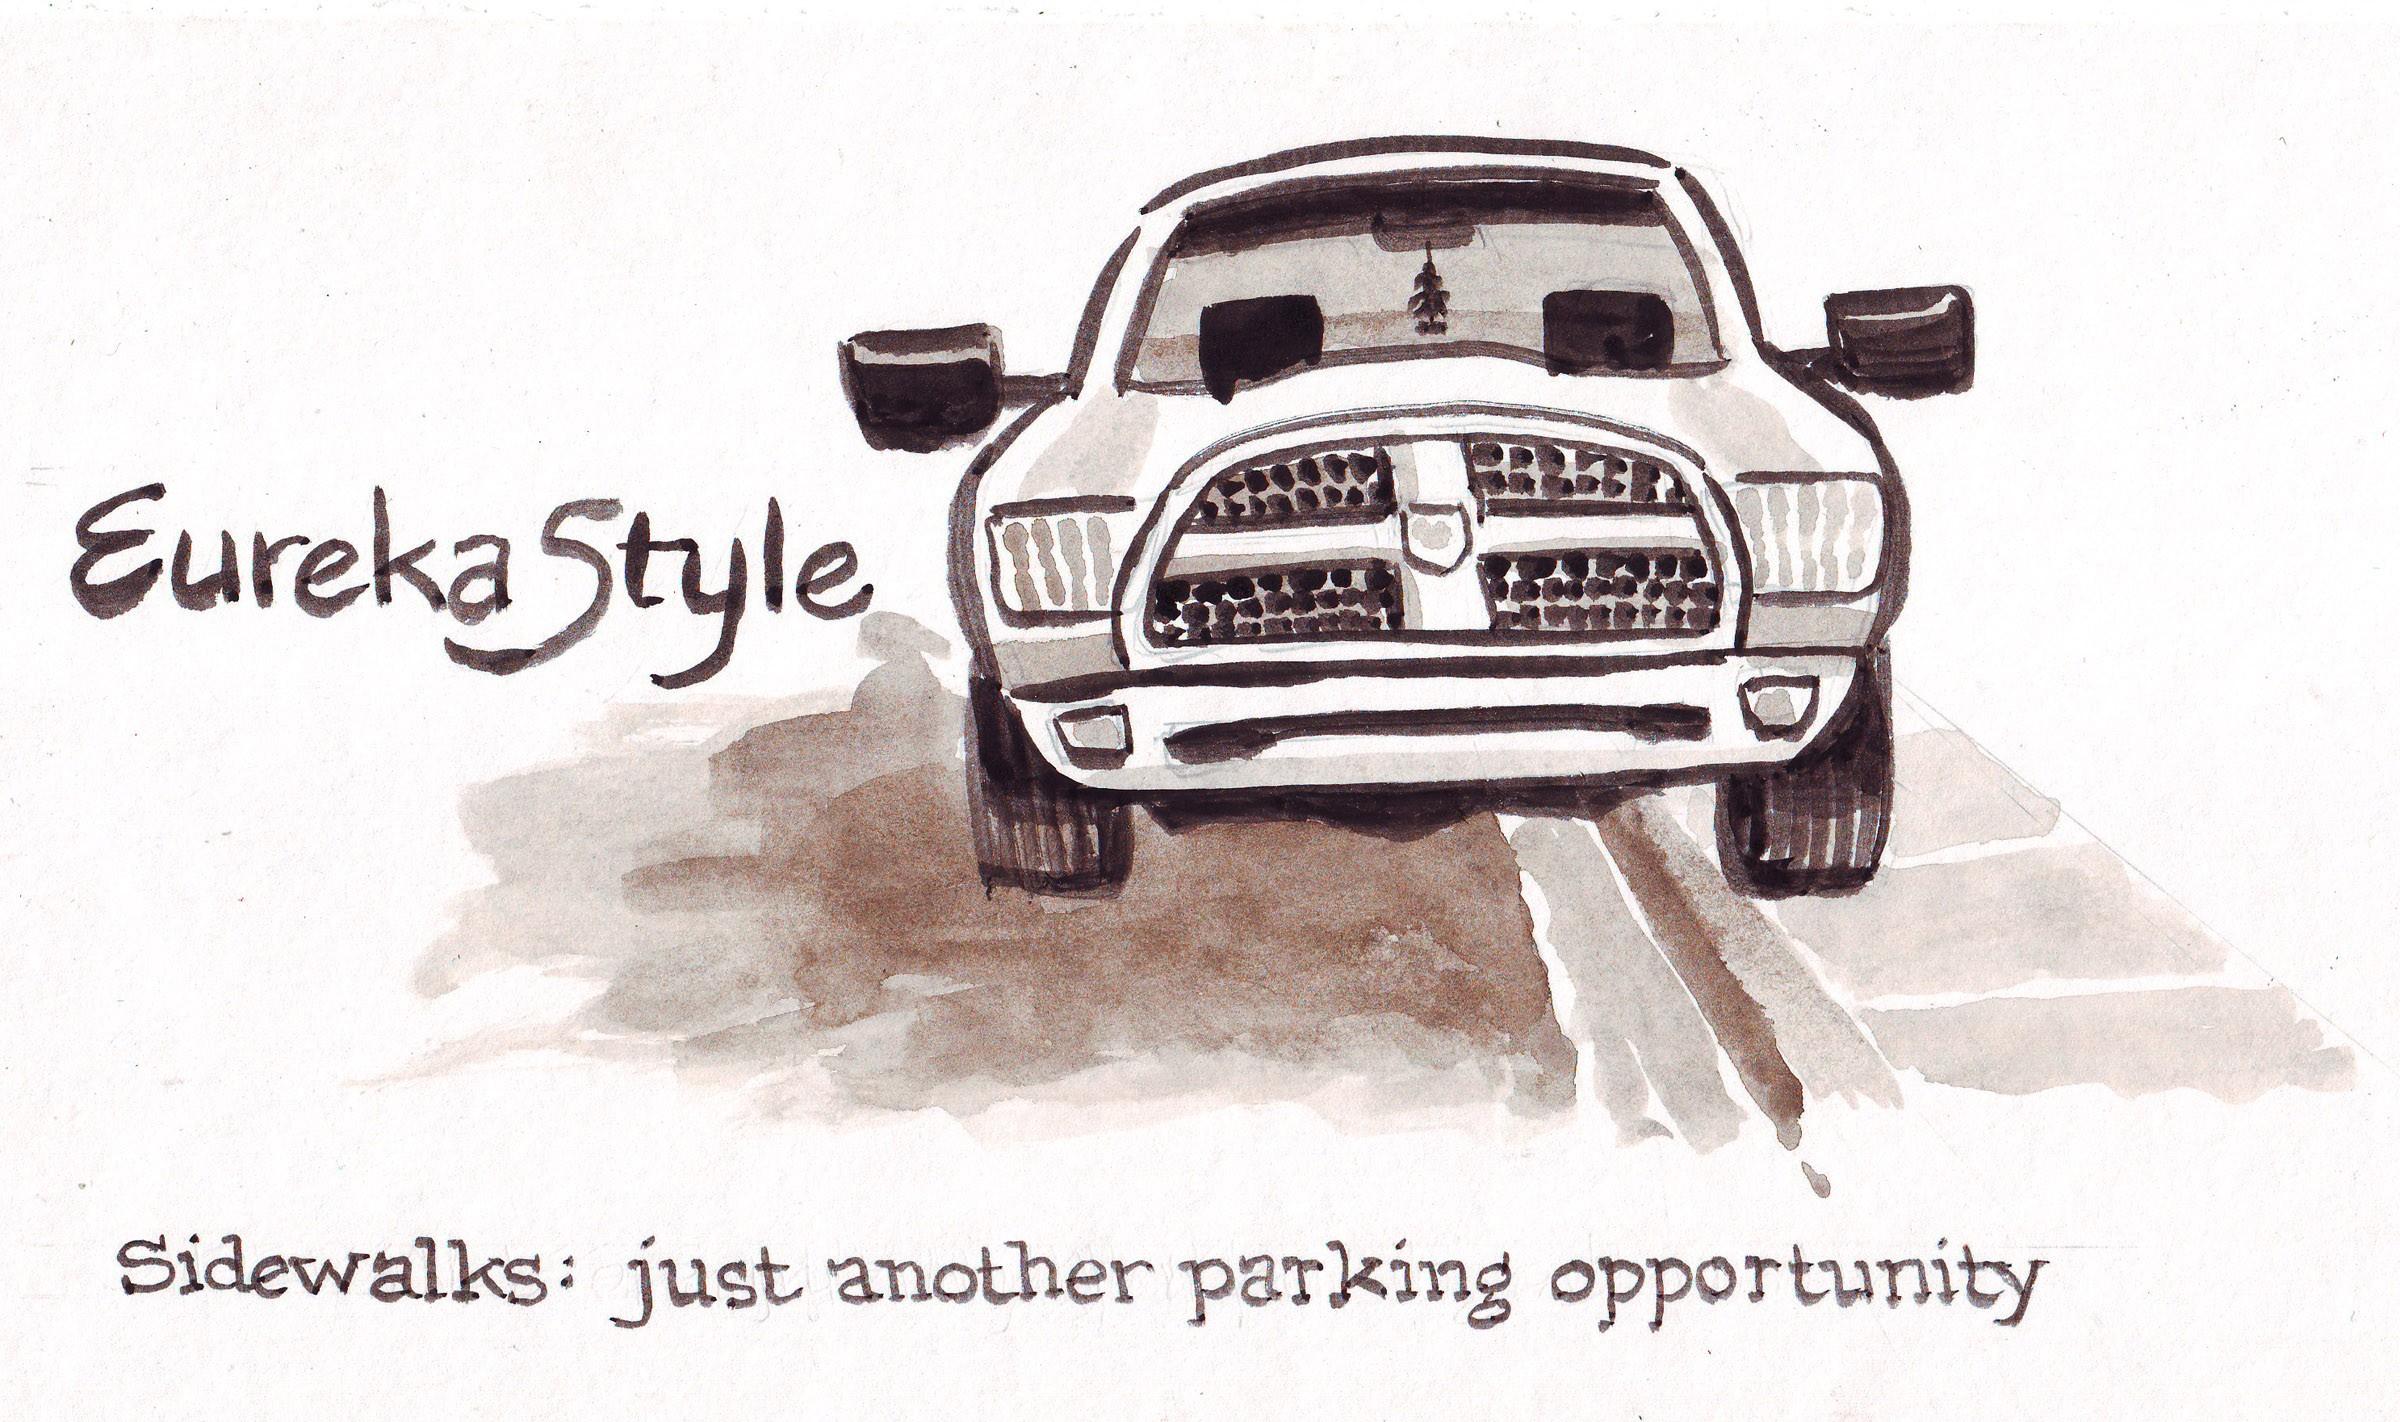 Eureka Style. Sidewalks: Just another parking opportunity. - JOEL MILEKE